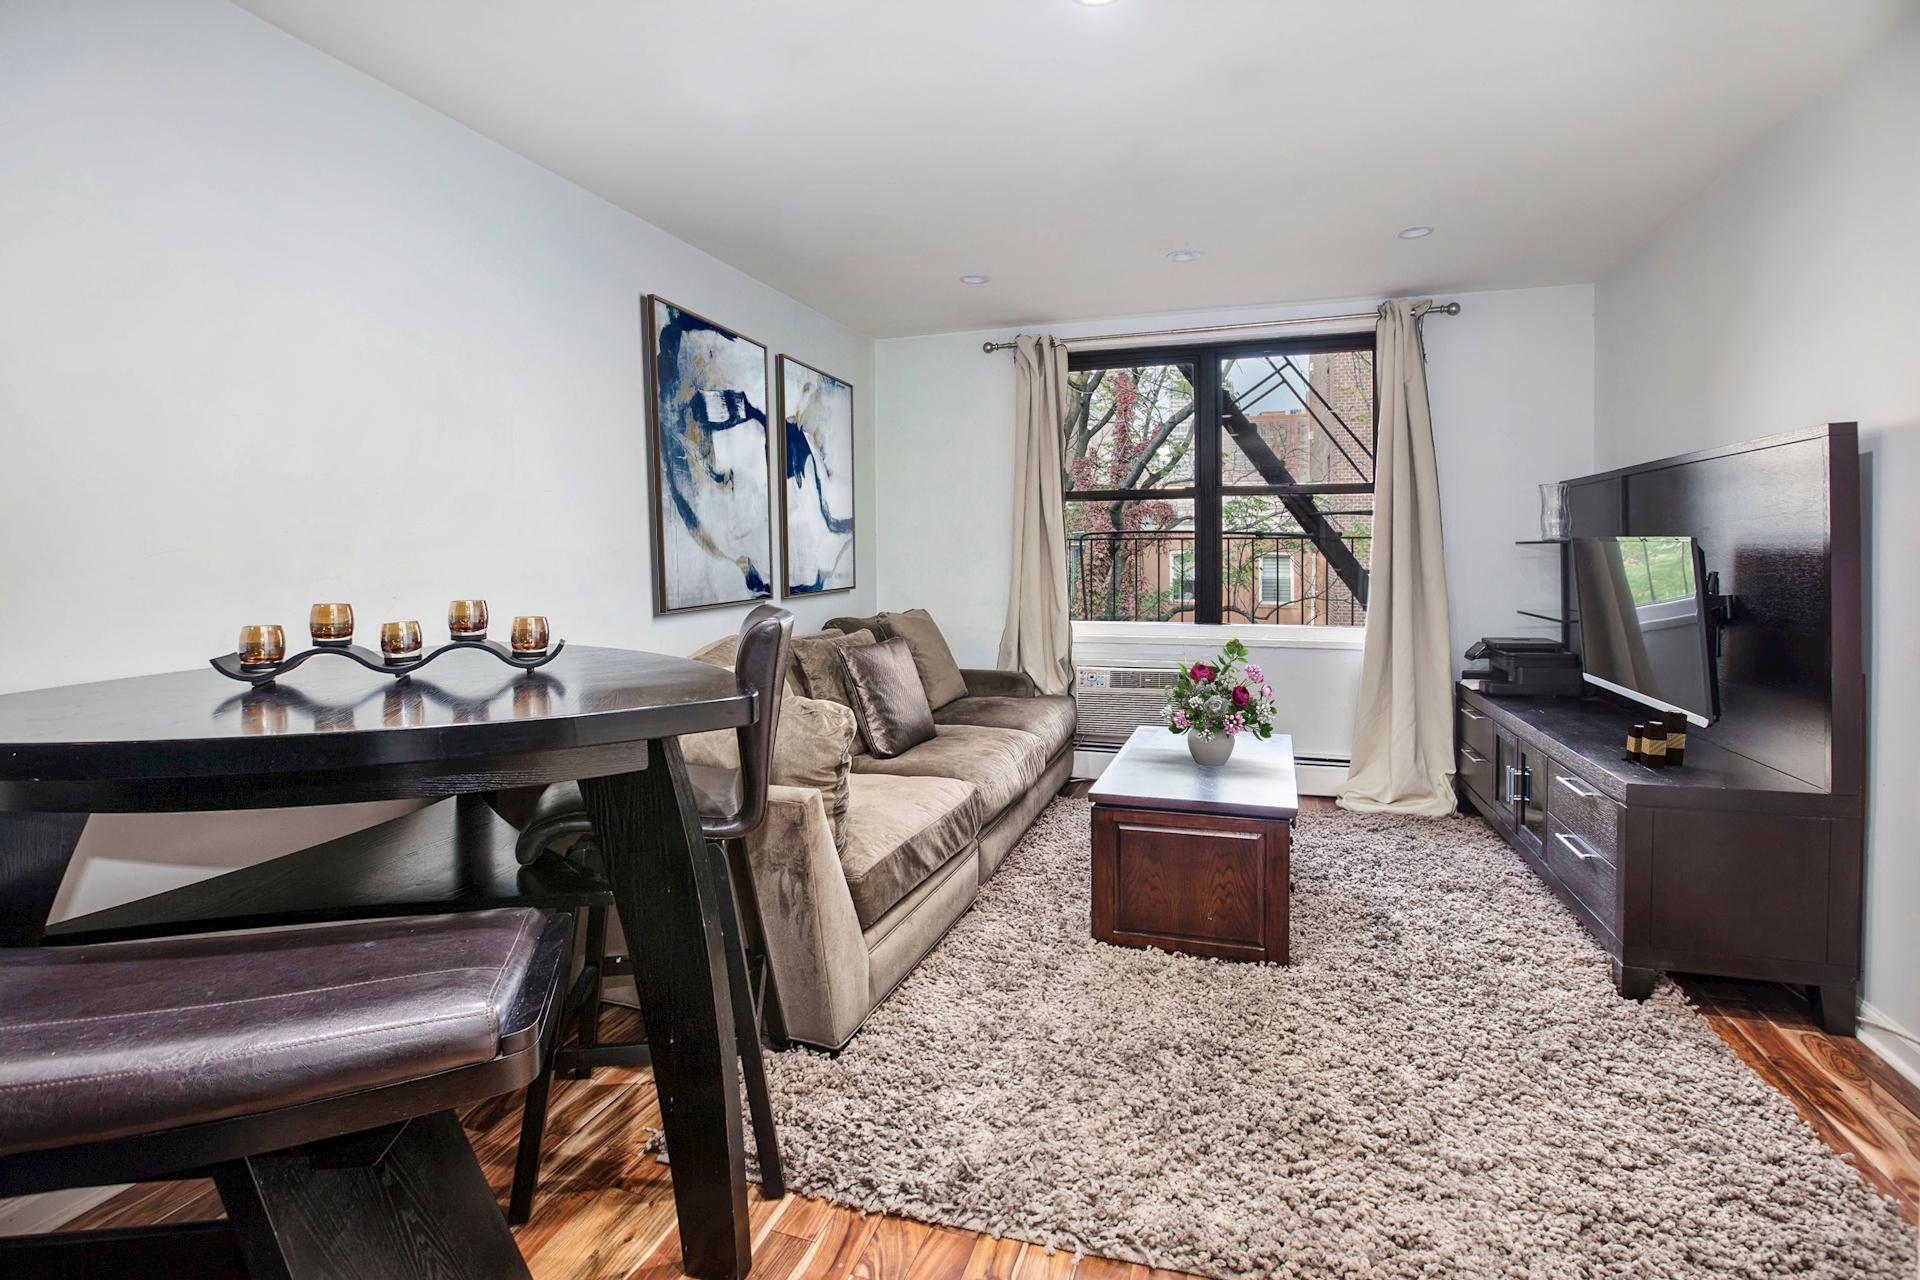 229 East 29th Street, #4F - $750,000